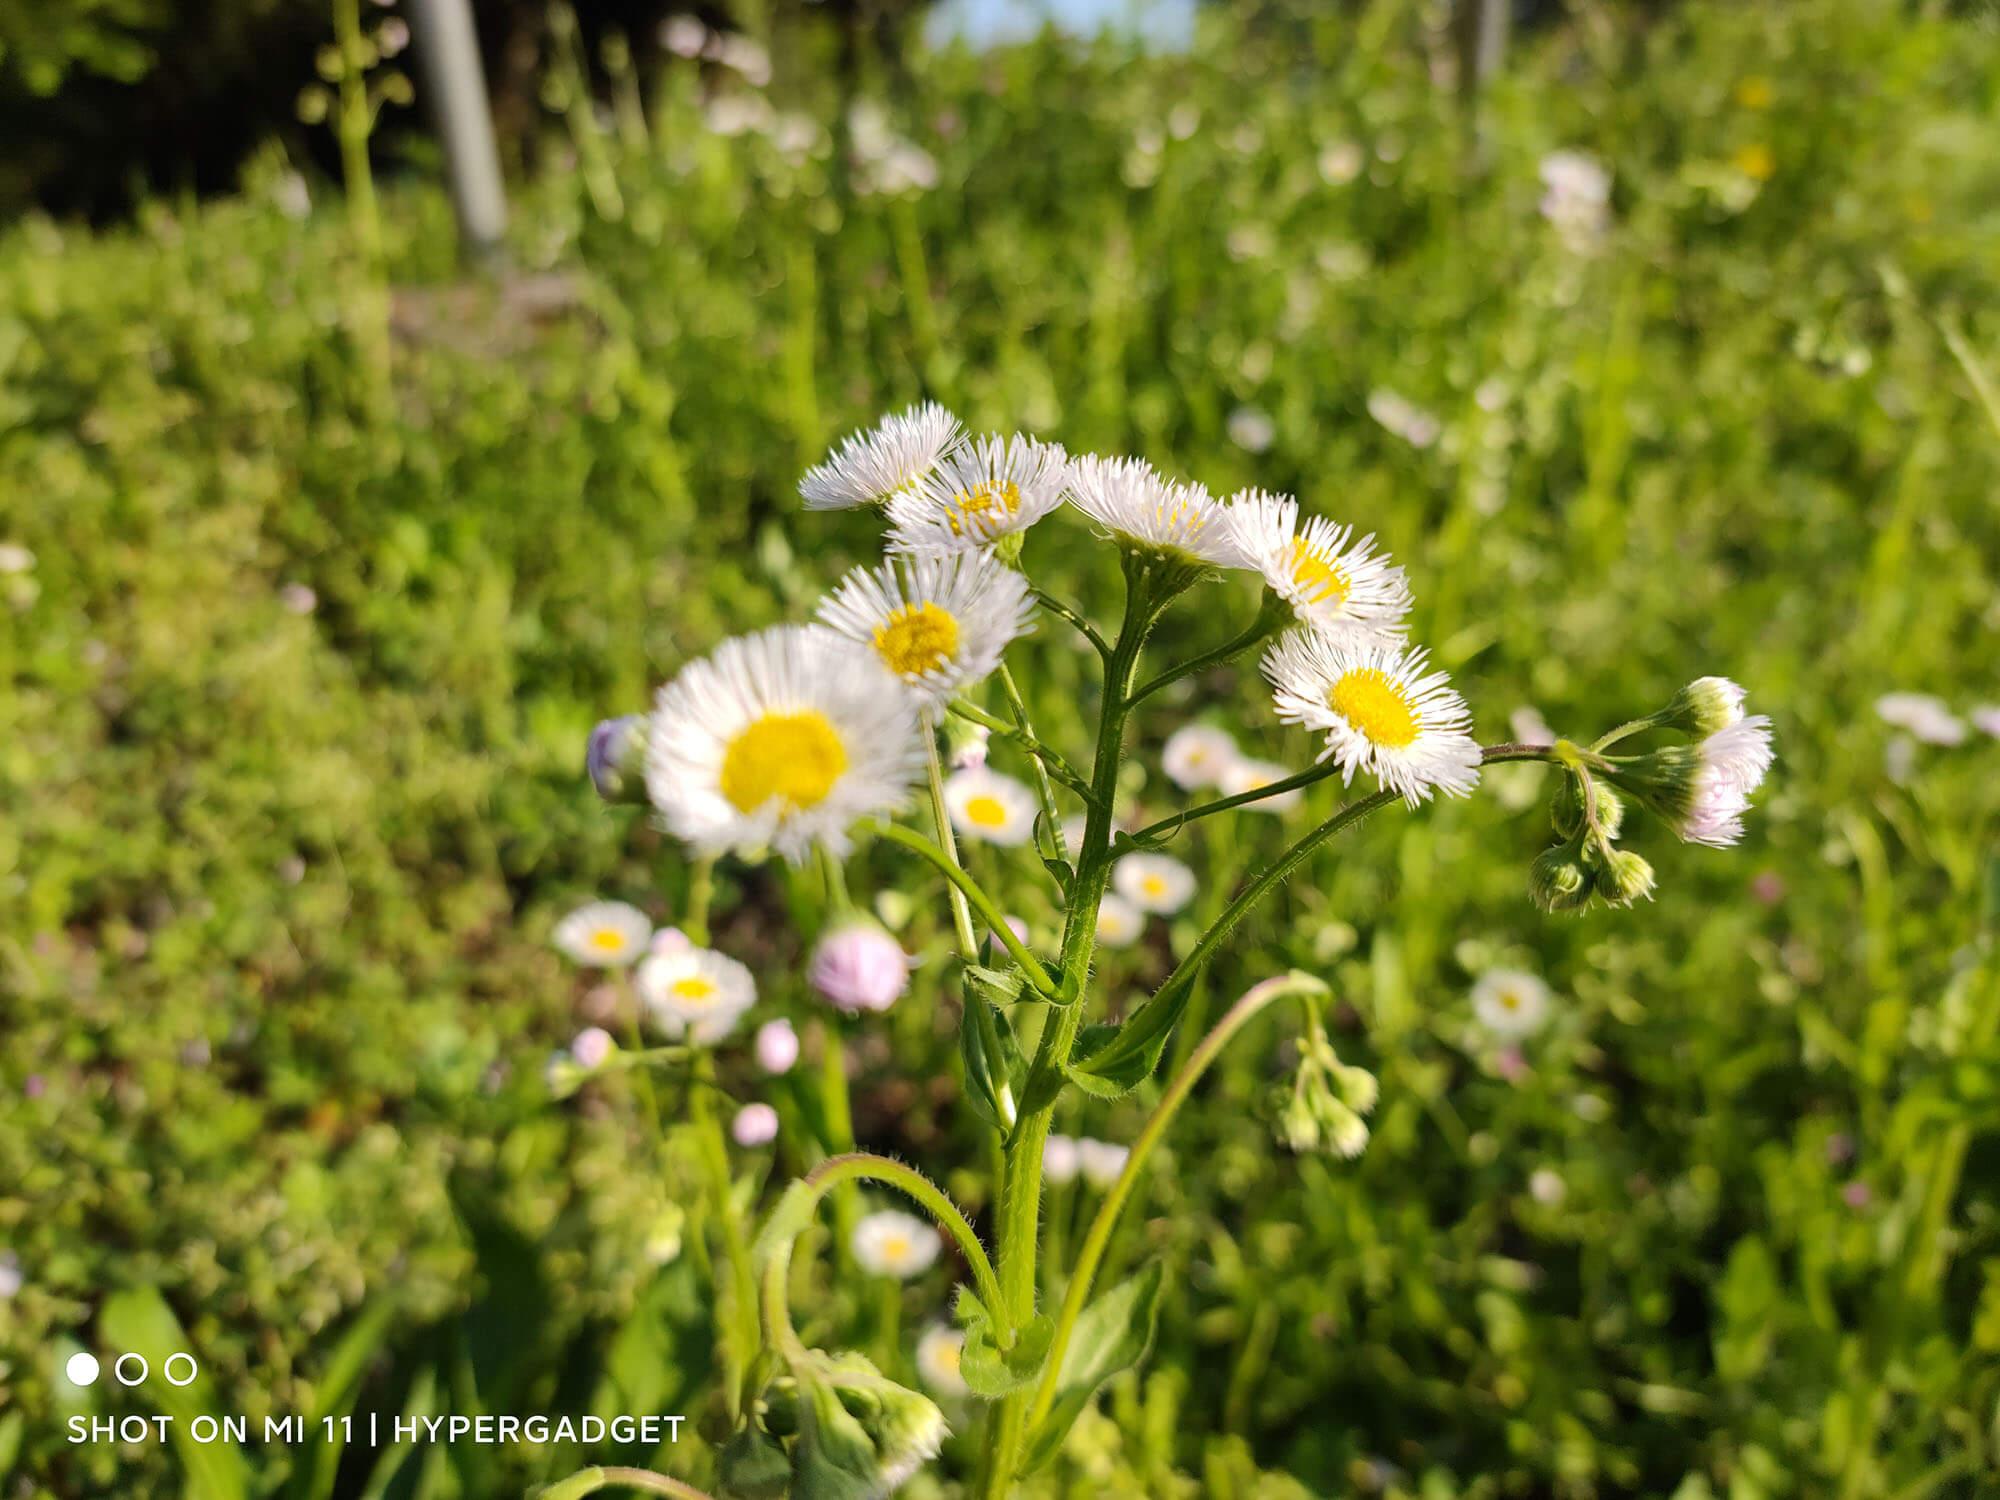 Mi 11で撮影した白い花の画像